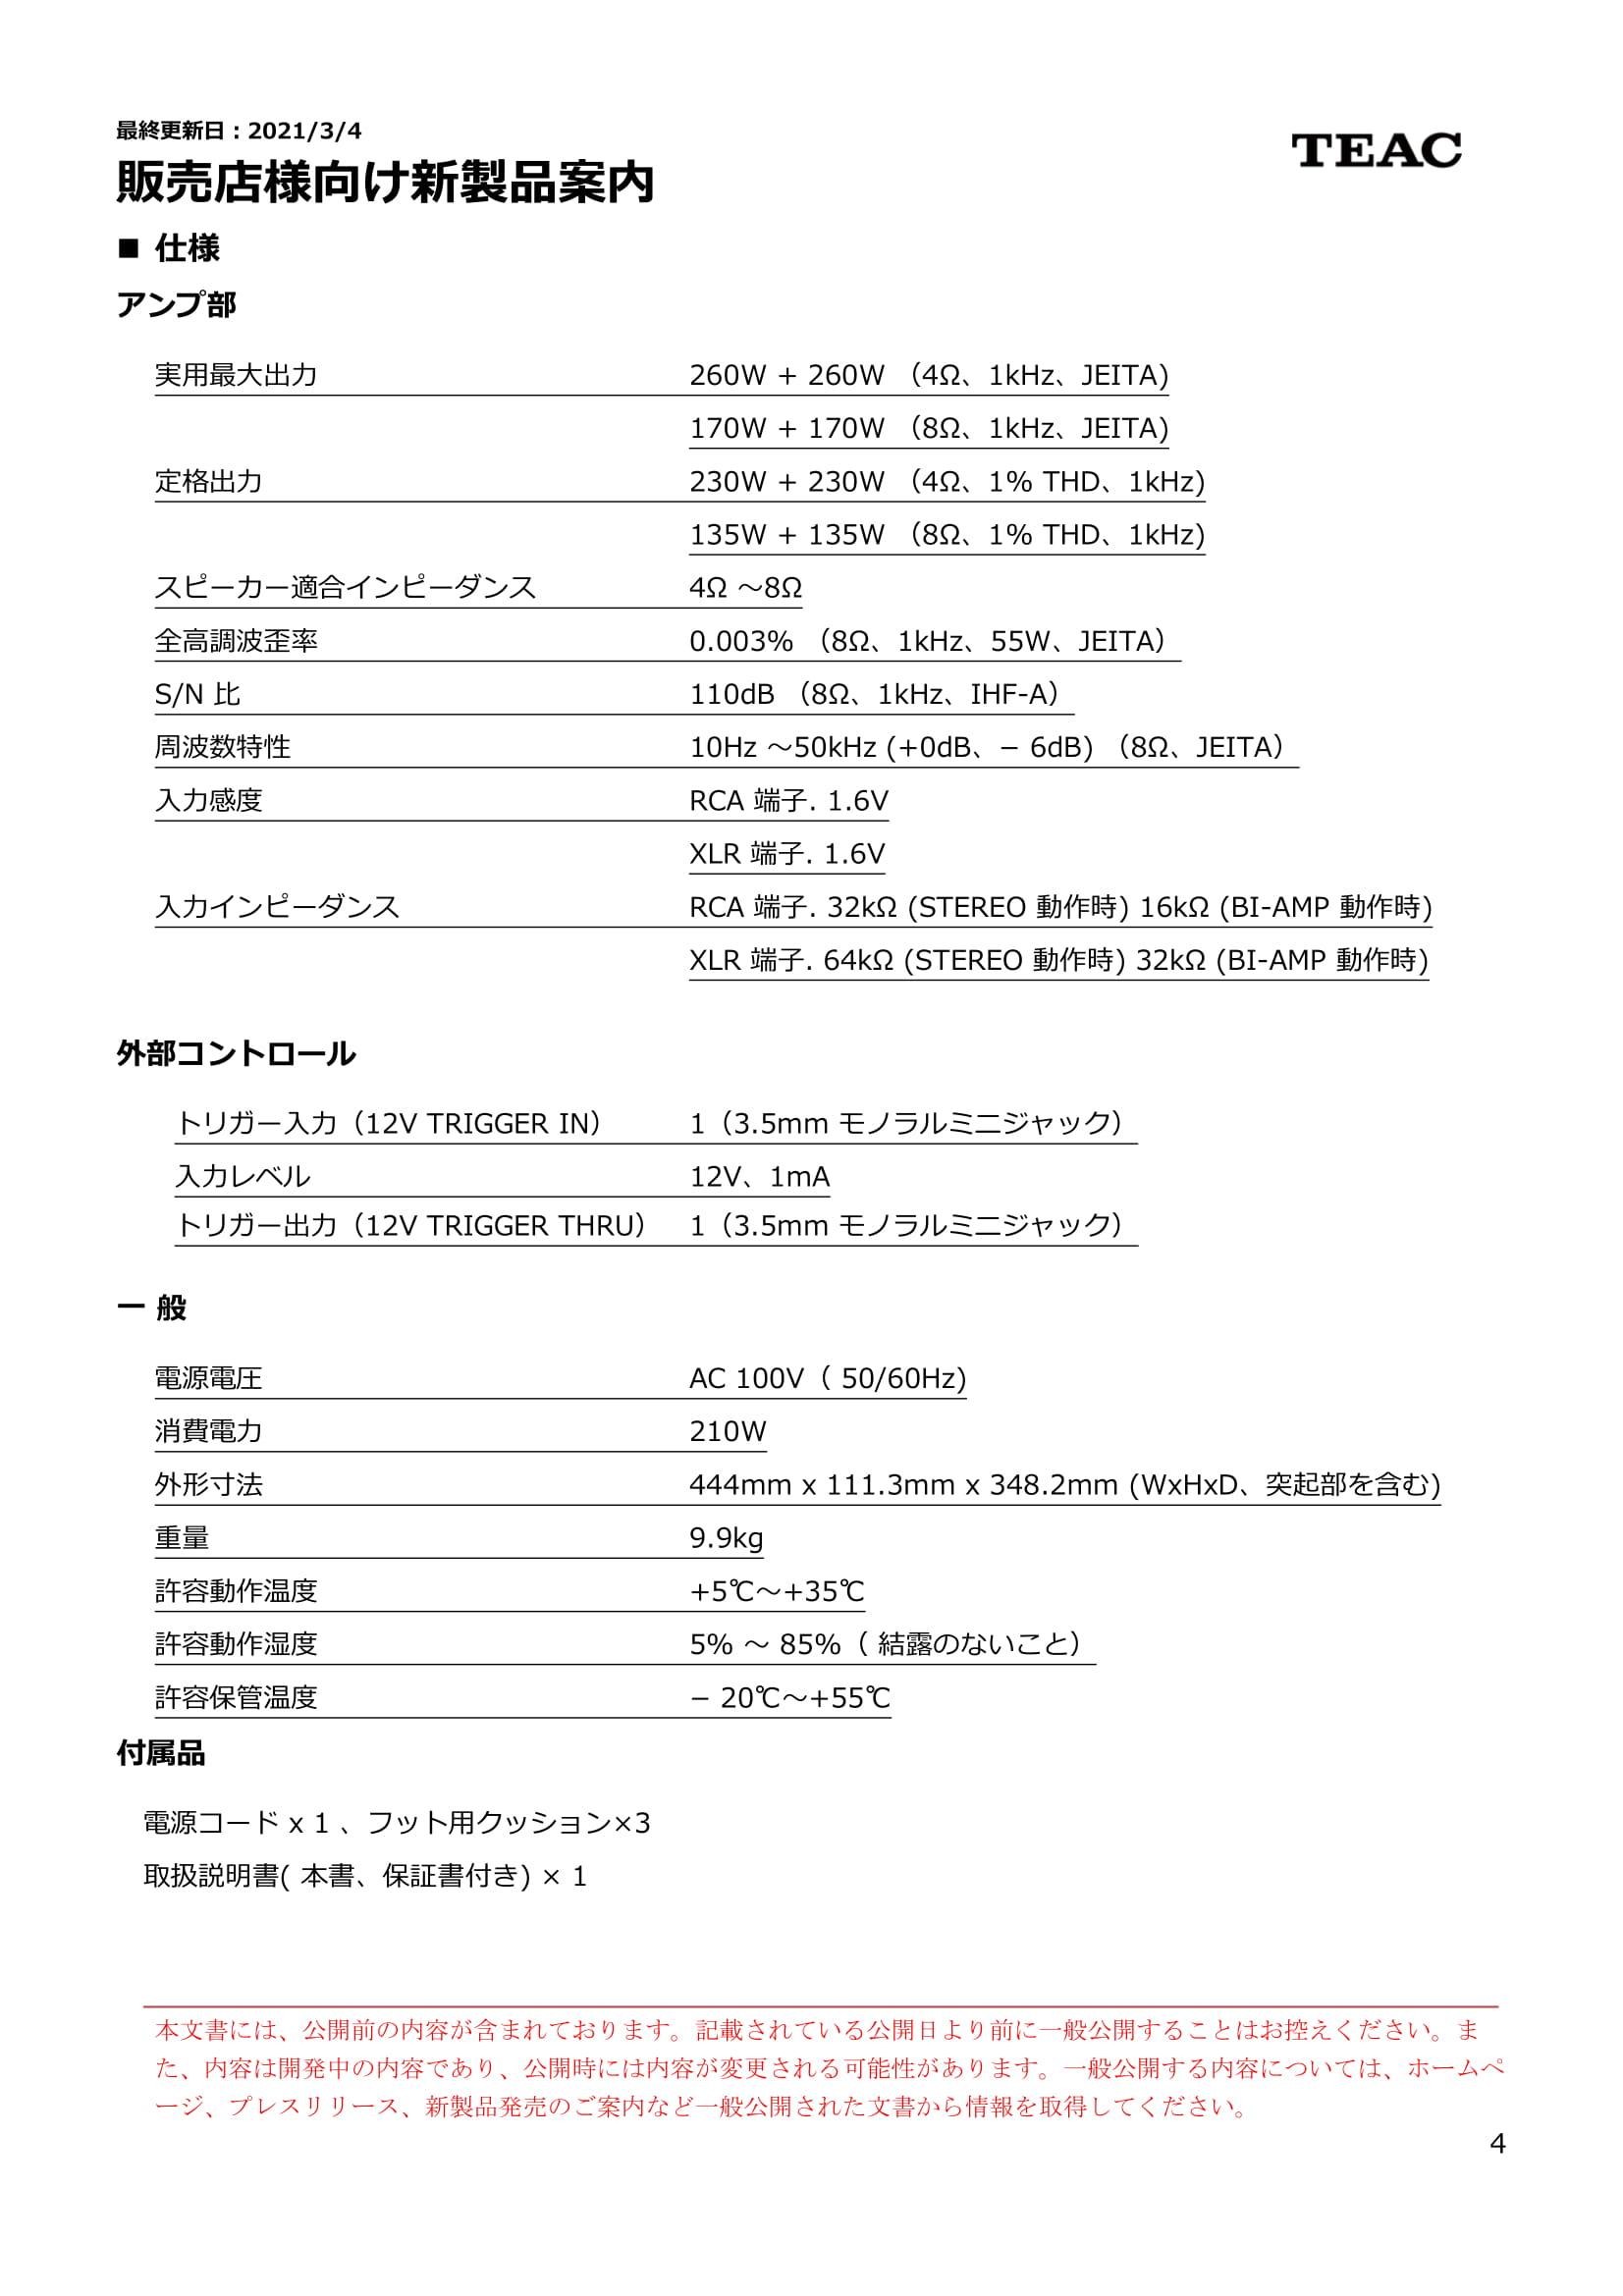 AP-701_SNPI_210304-4.jpg